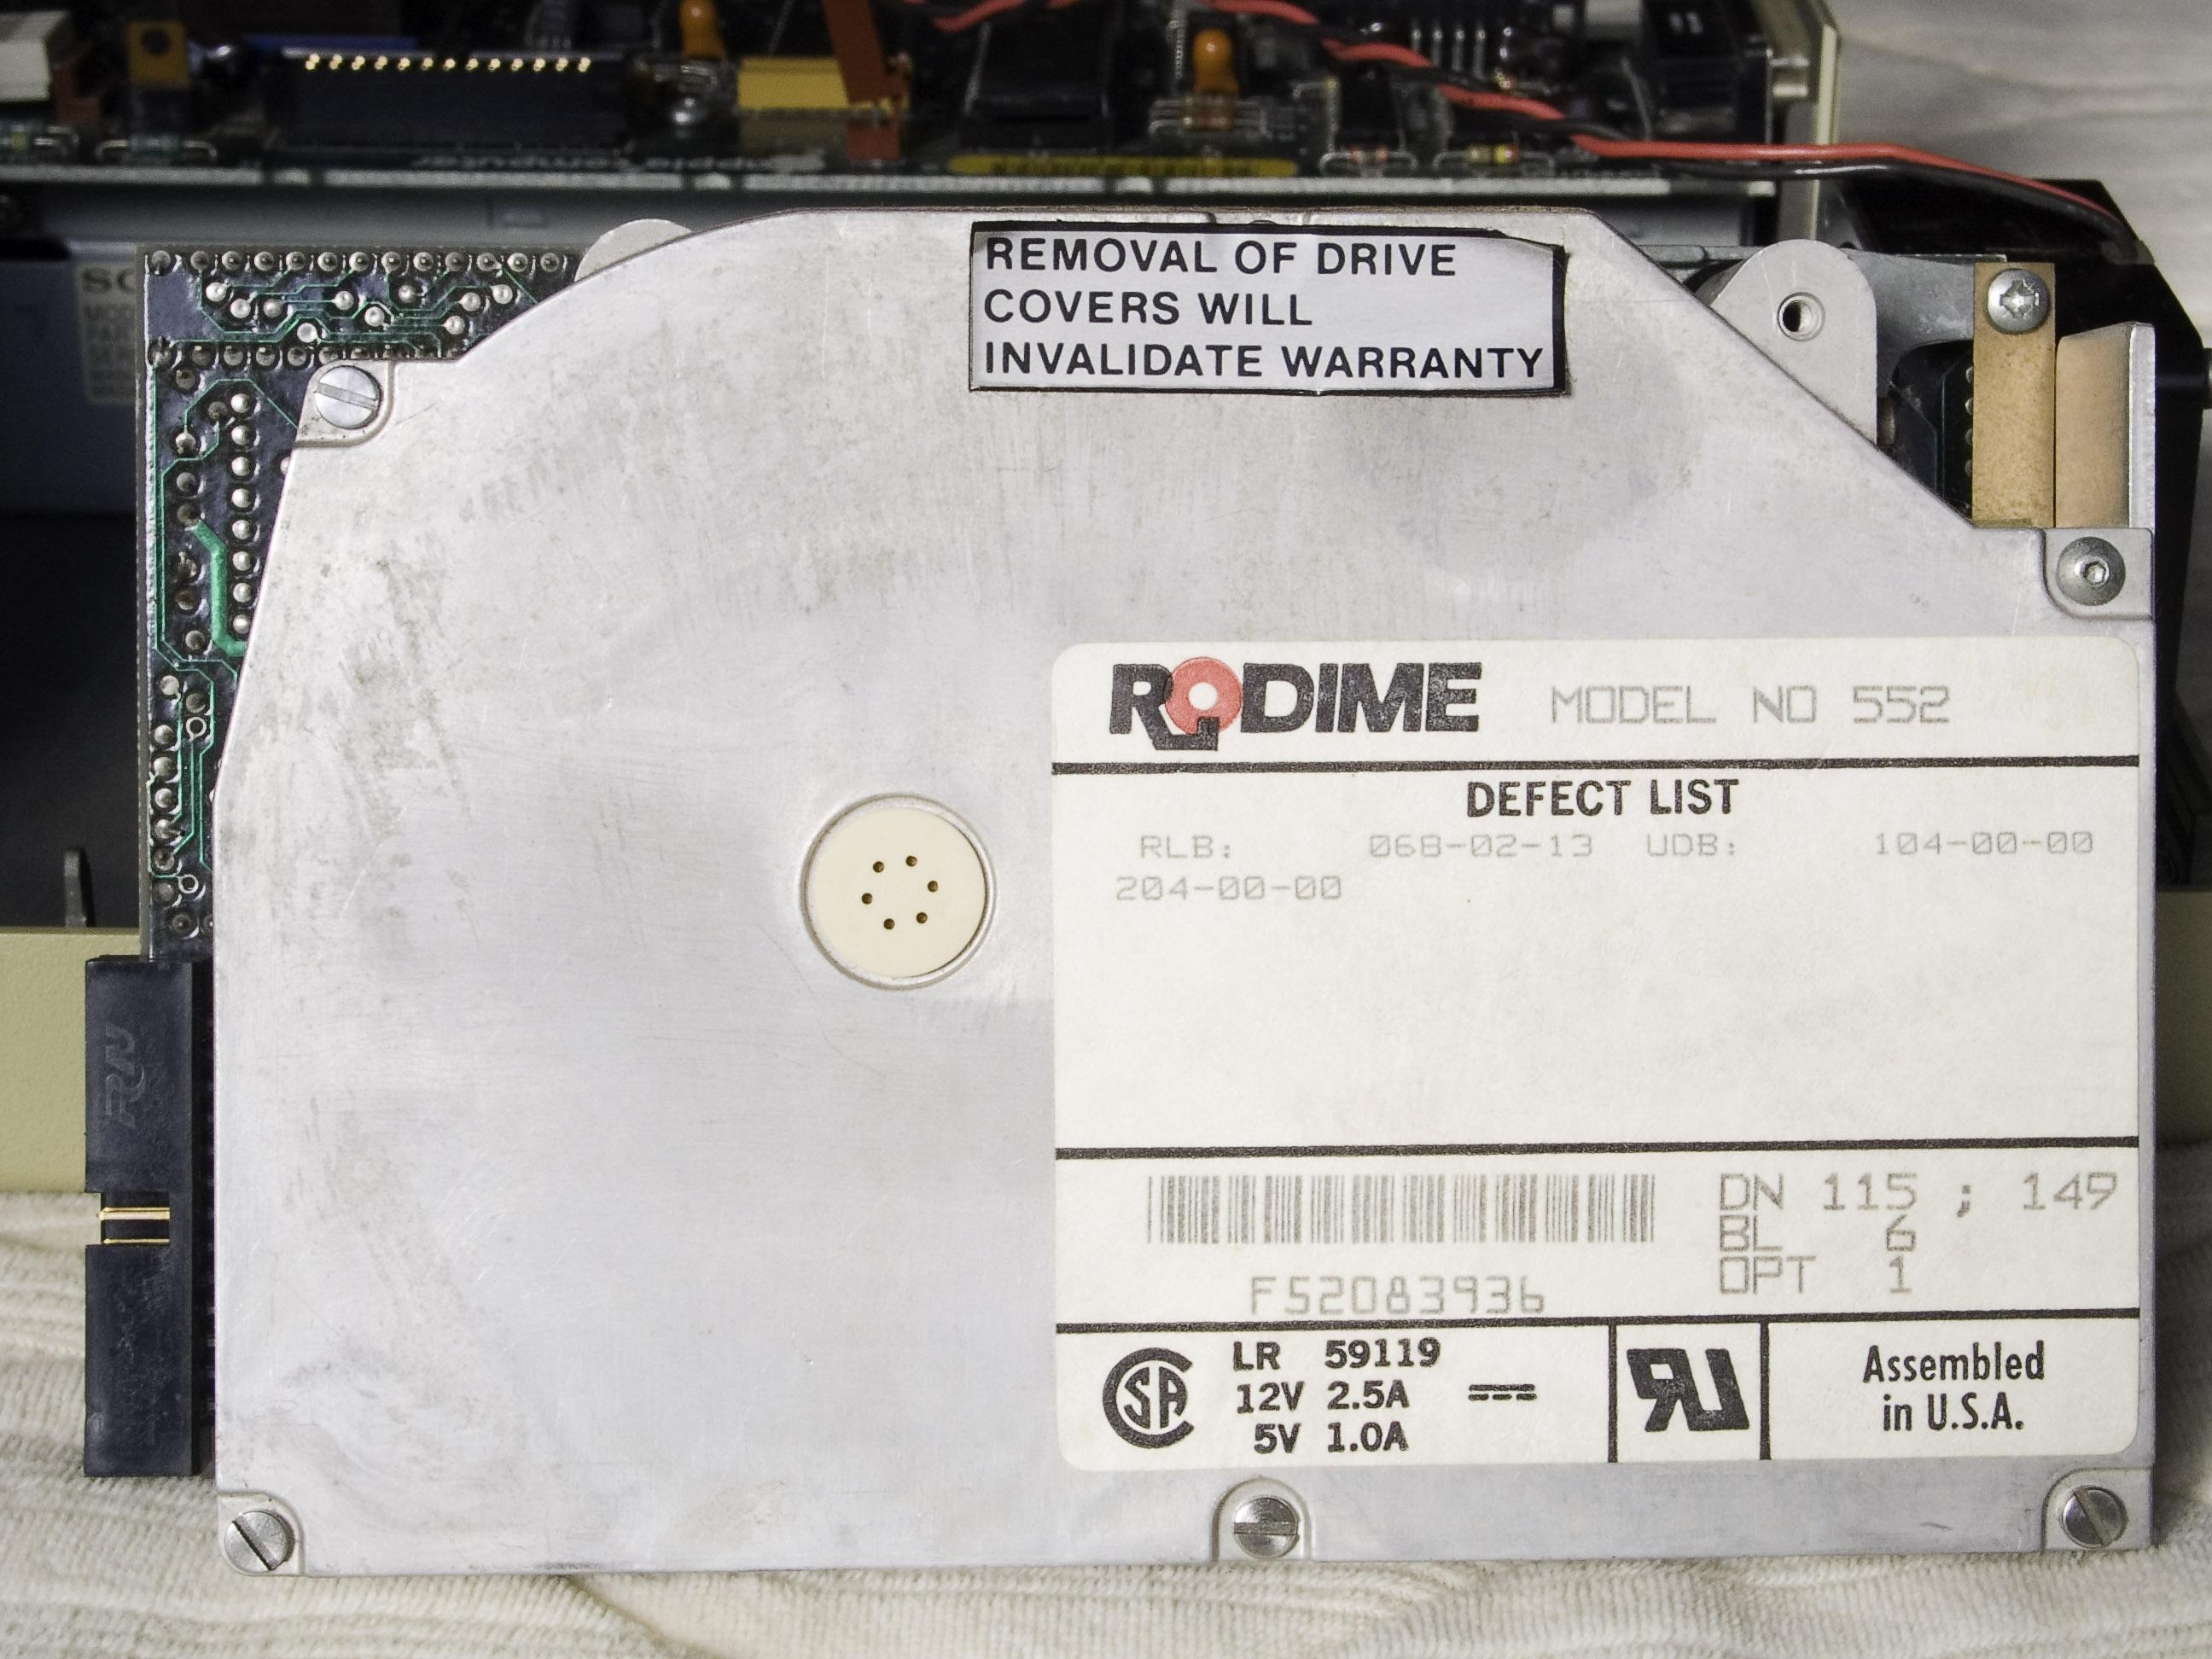 HD20 Rodime Hard Drive -- Top View